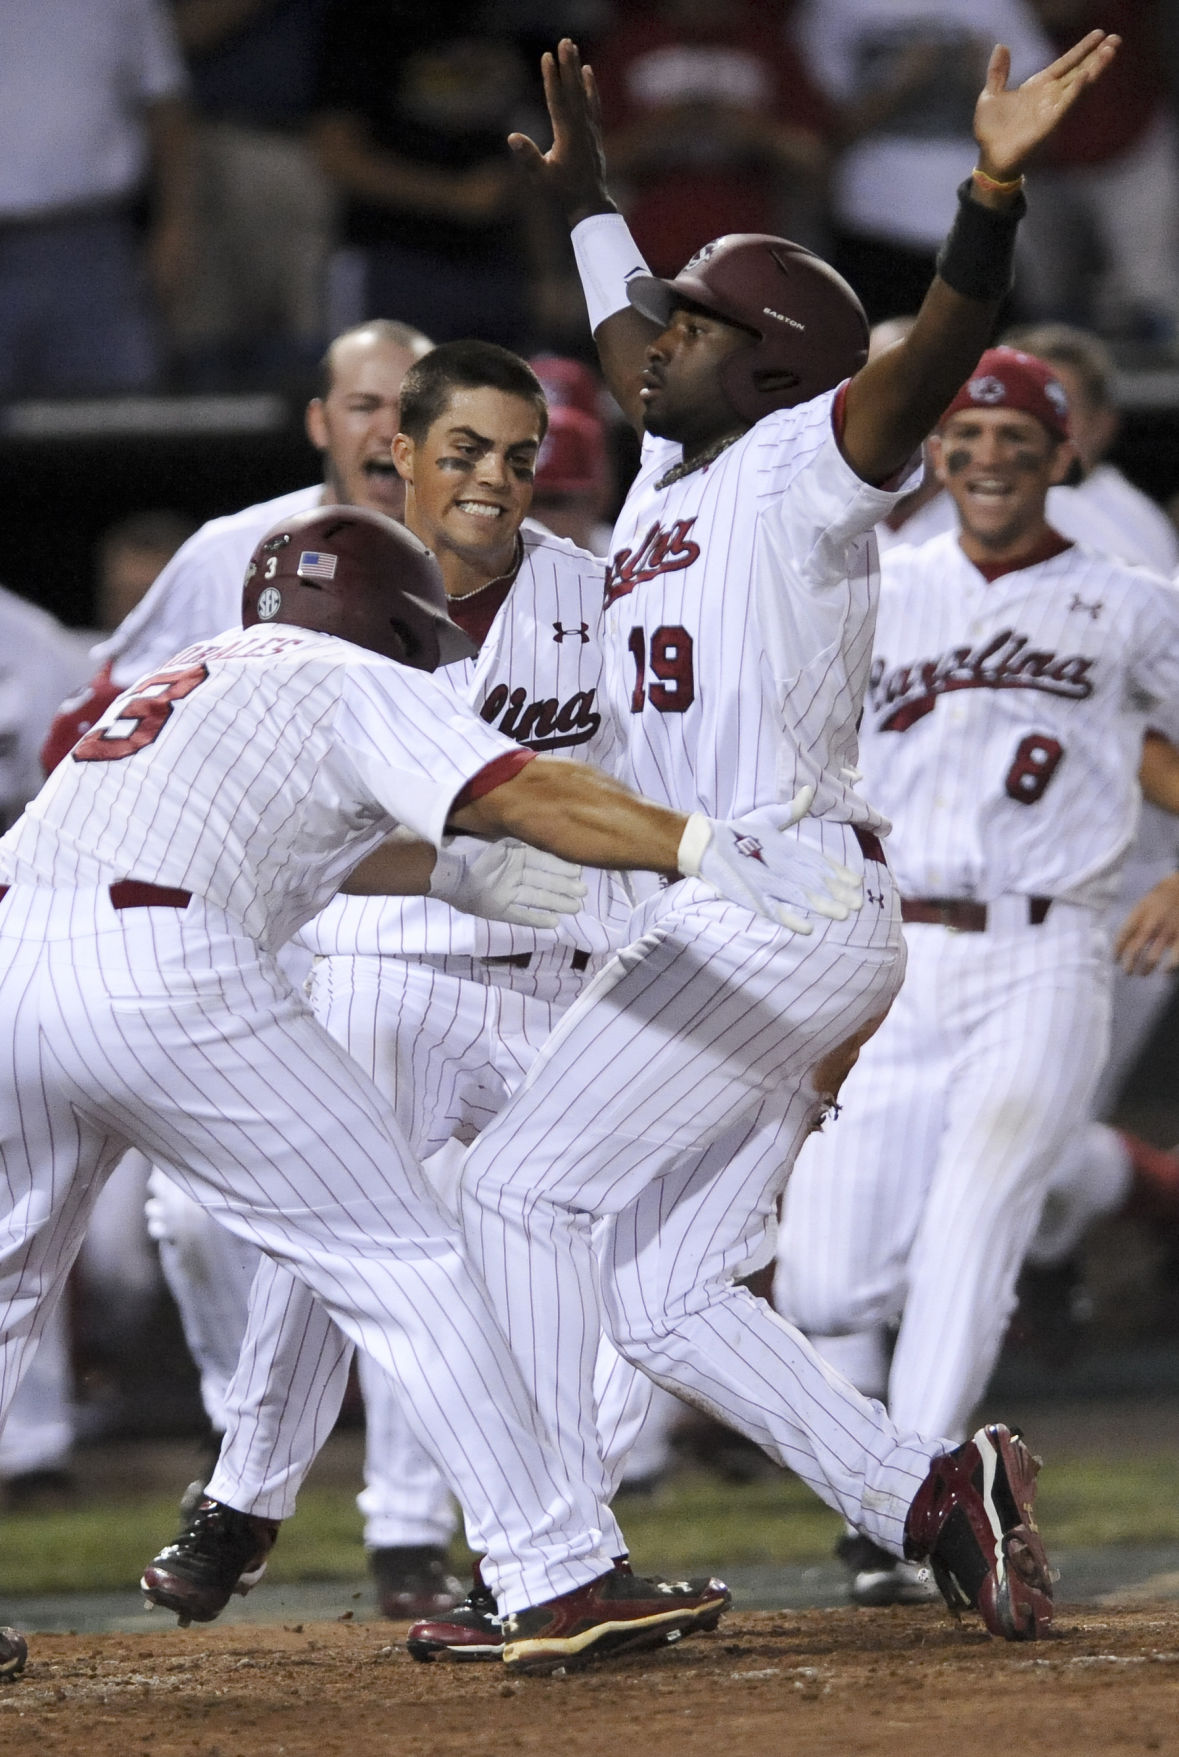 2010 - Game 3 USC/Oklahoma